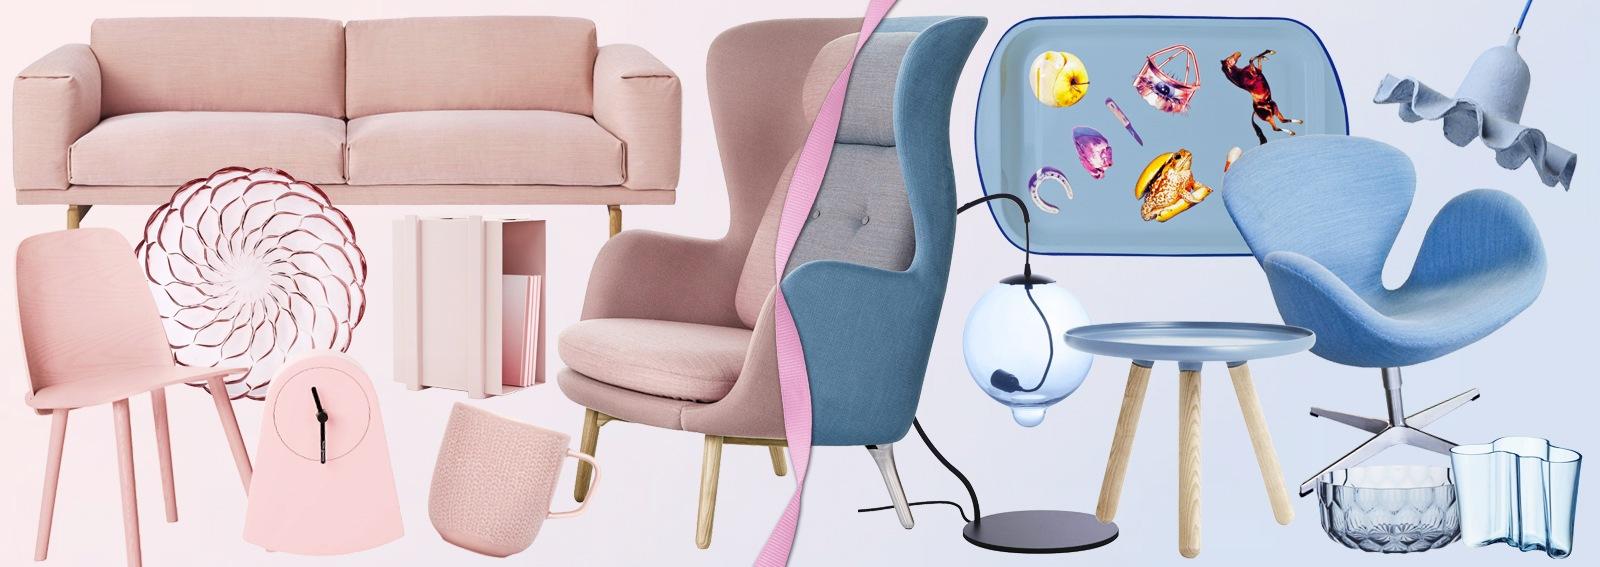 cover-rosa-quartz-e-serenity-desktop